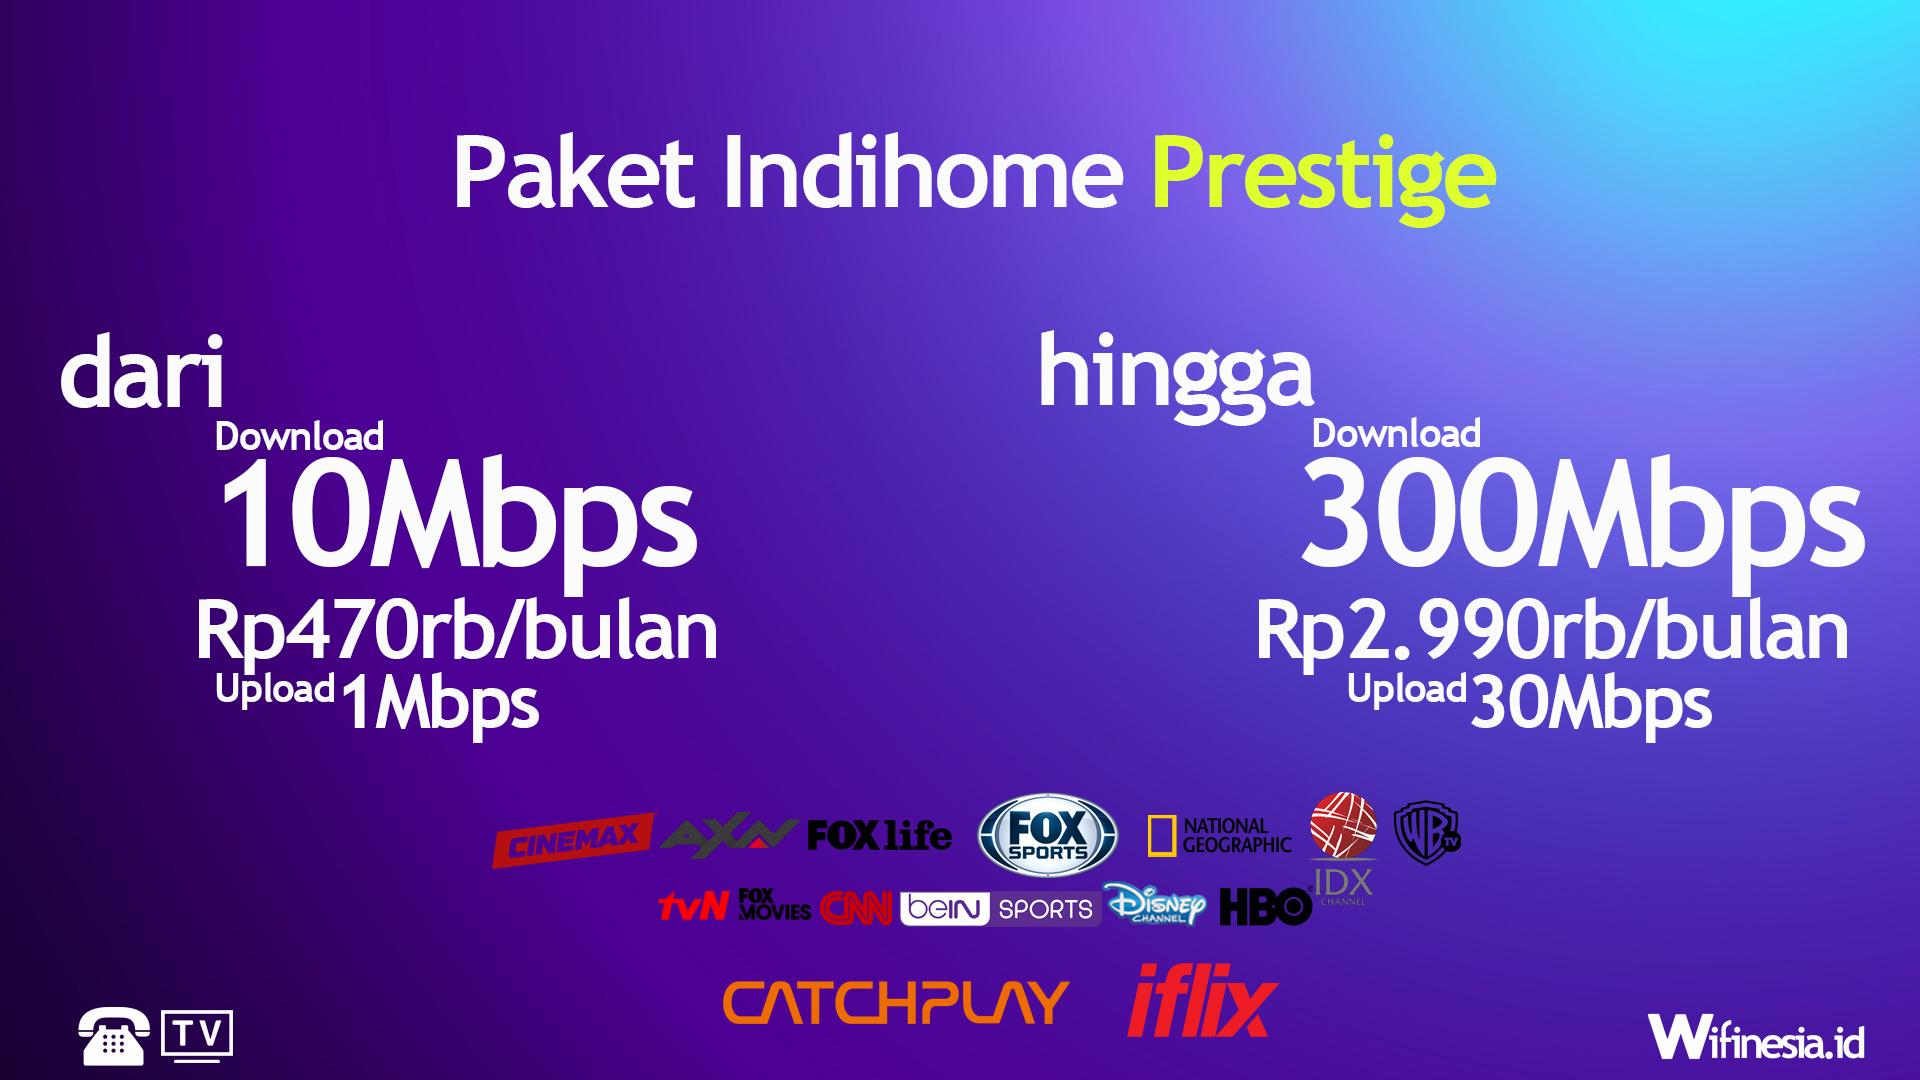 Harga Paket IndiHome Prestige